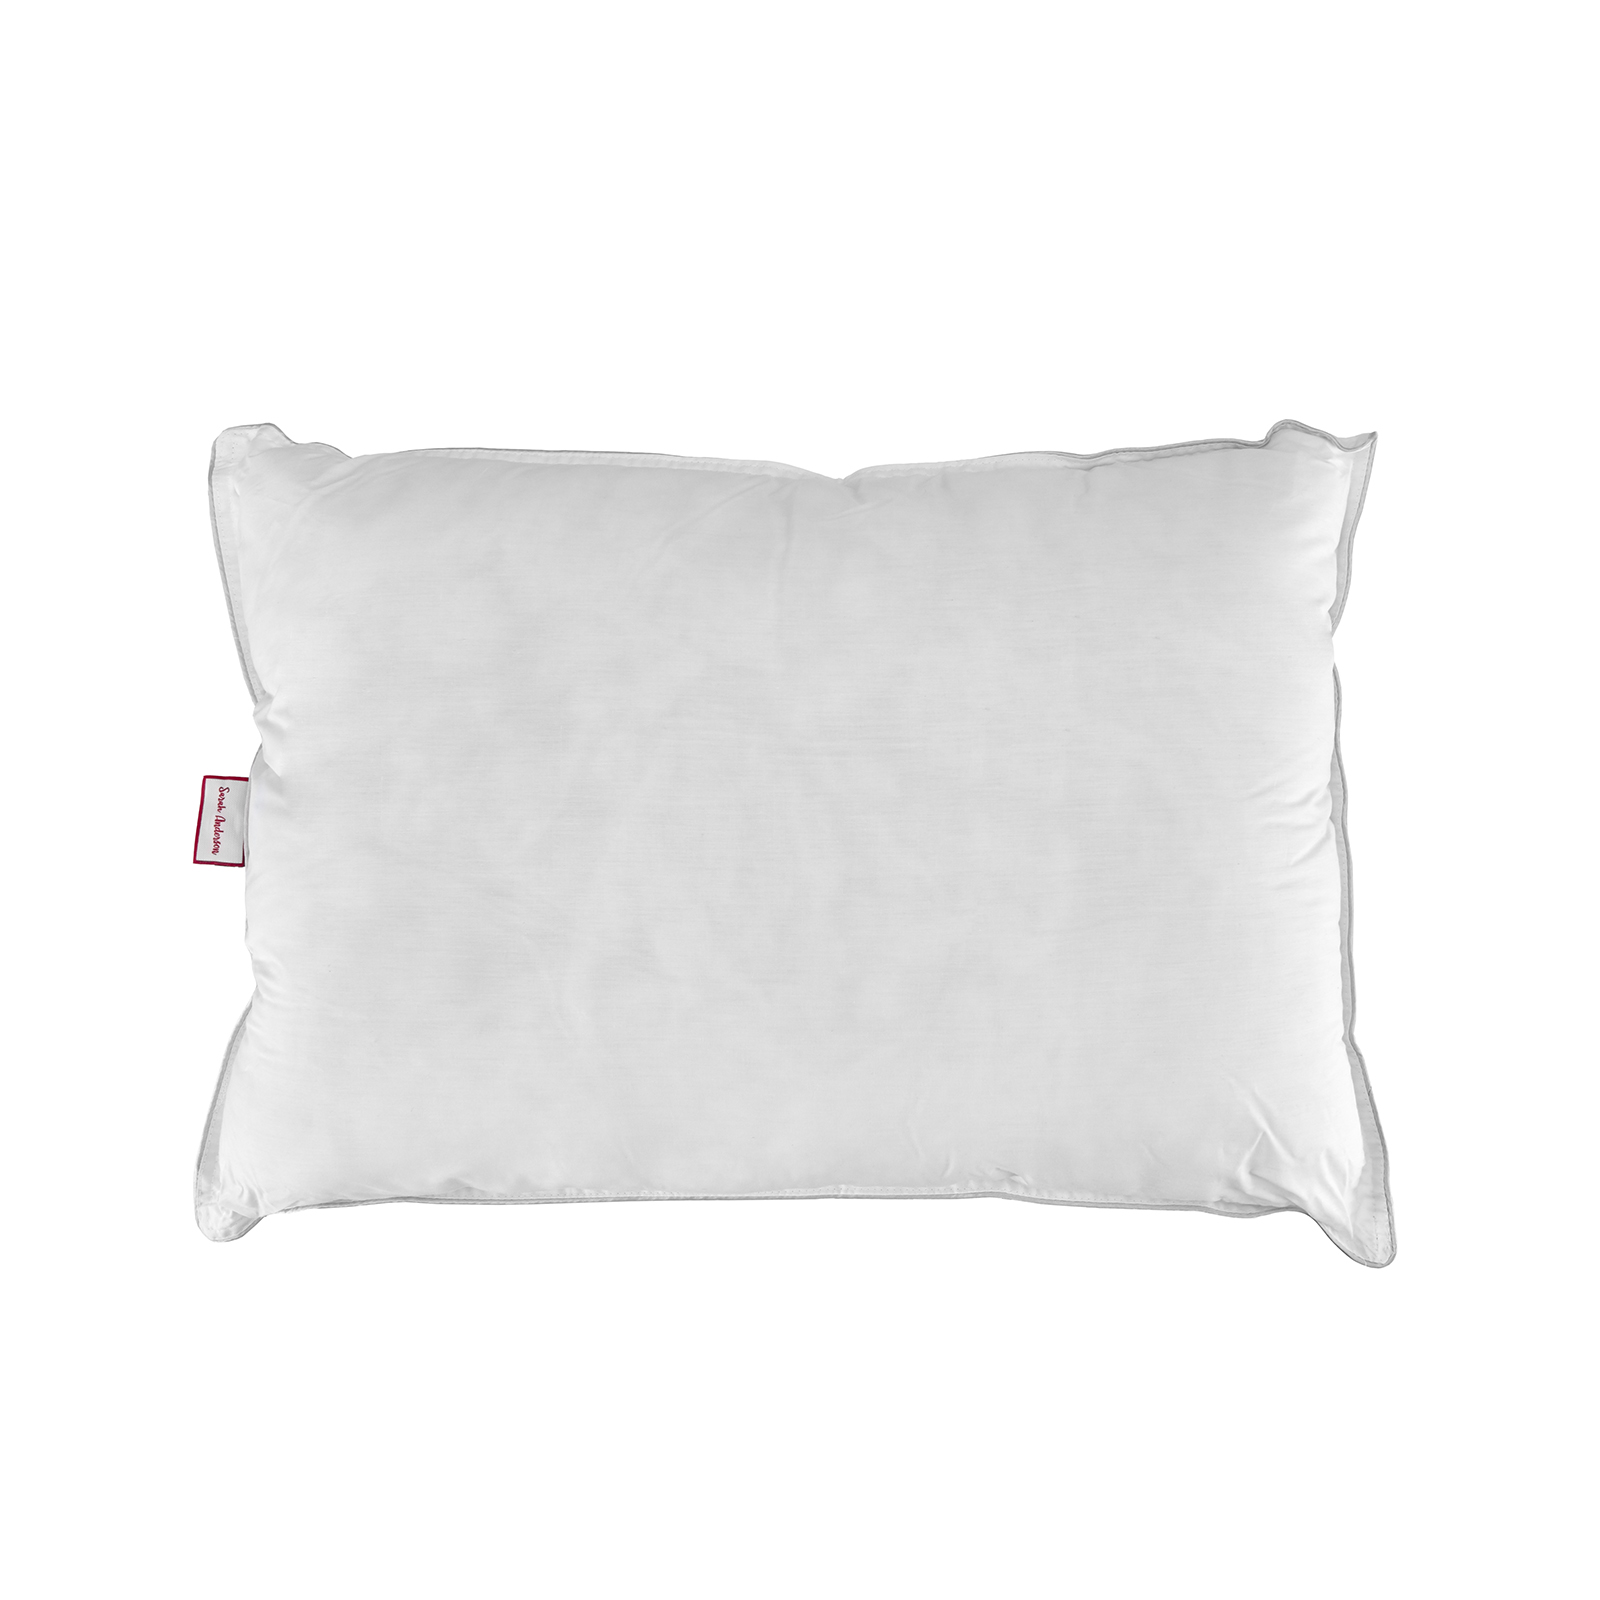 Sarah Anderson Comfy Gri Biyeli Elyaf Yastık 50x70 cm